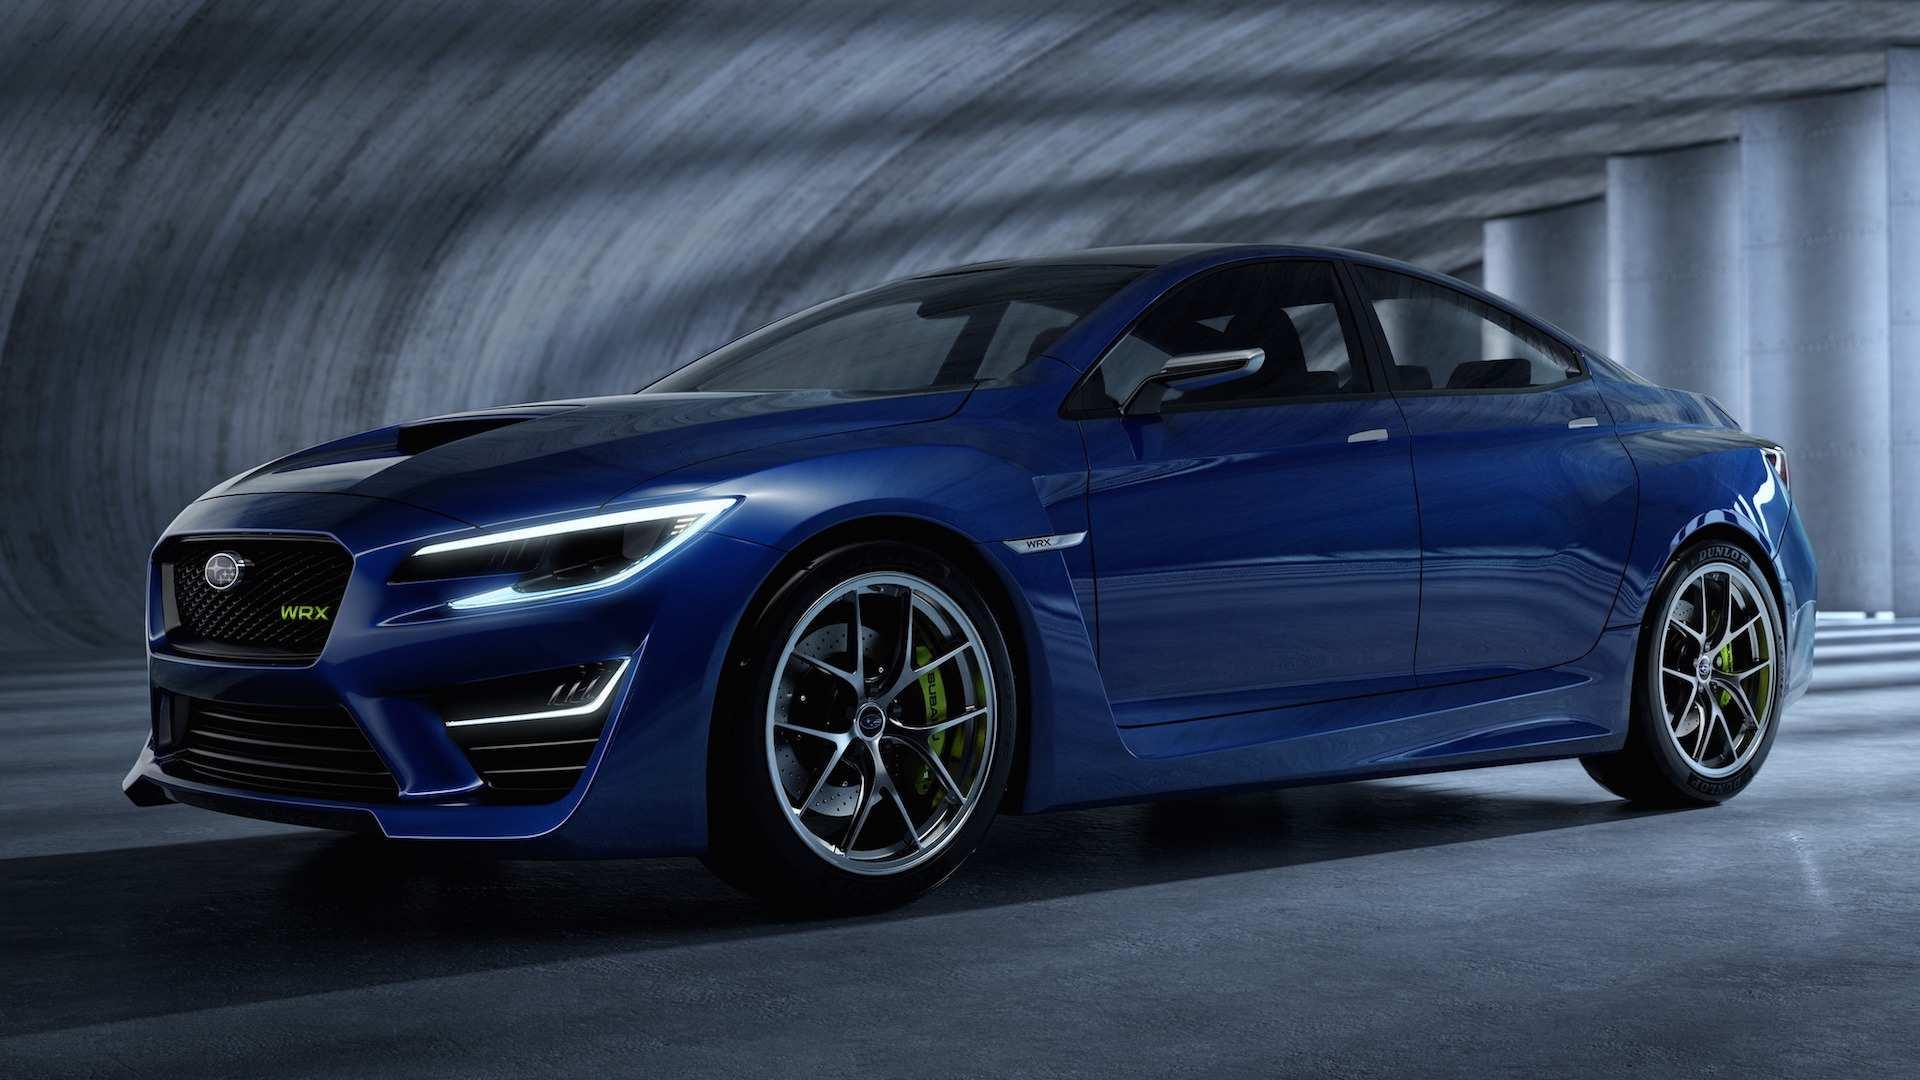 26 Concept of Wrx Subaru 2020 Release Date by Wrx Subaru 2020